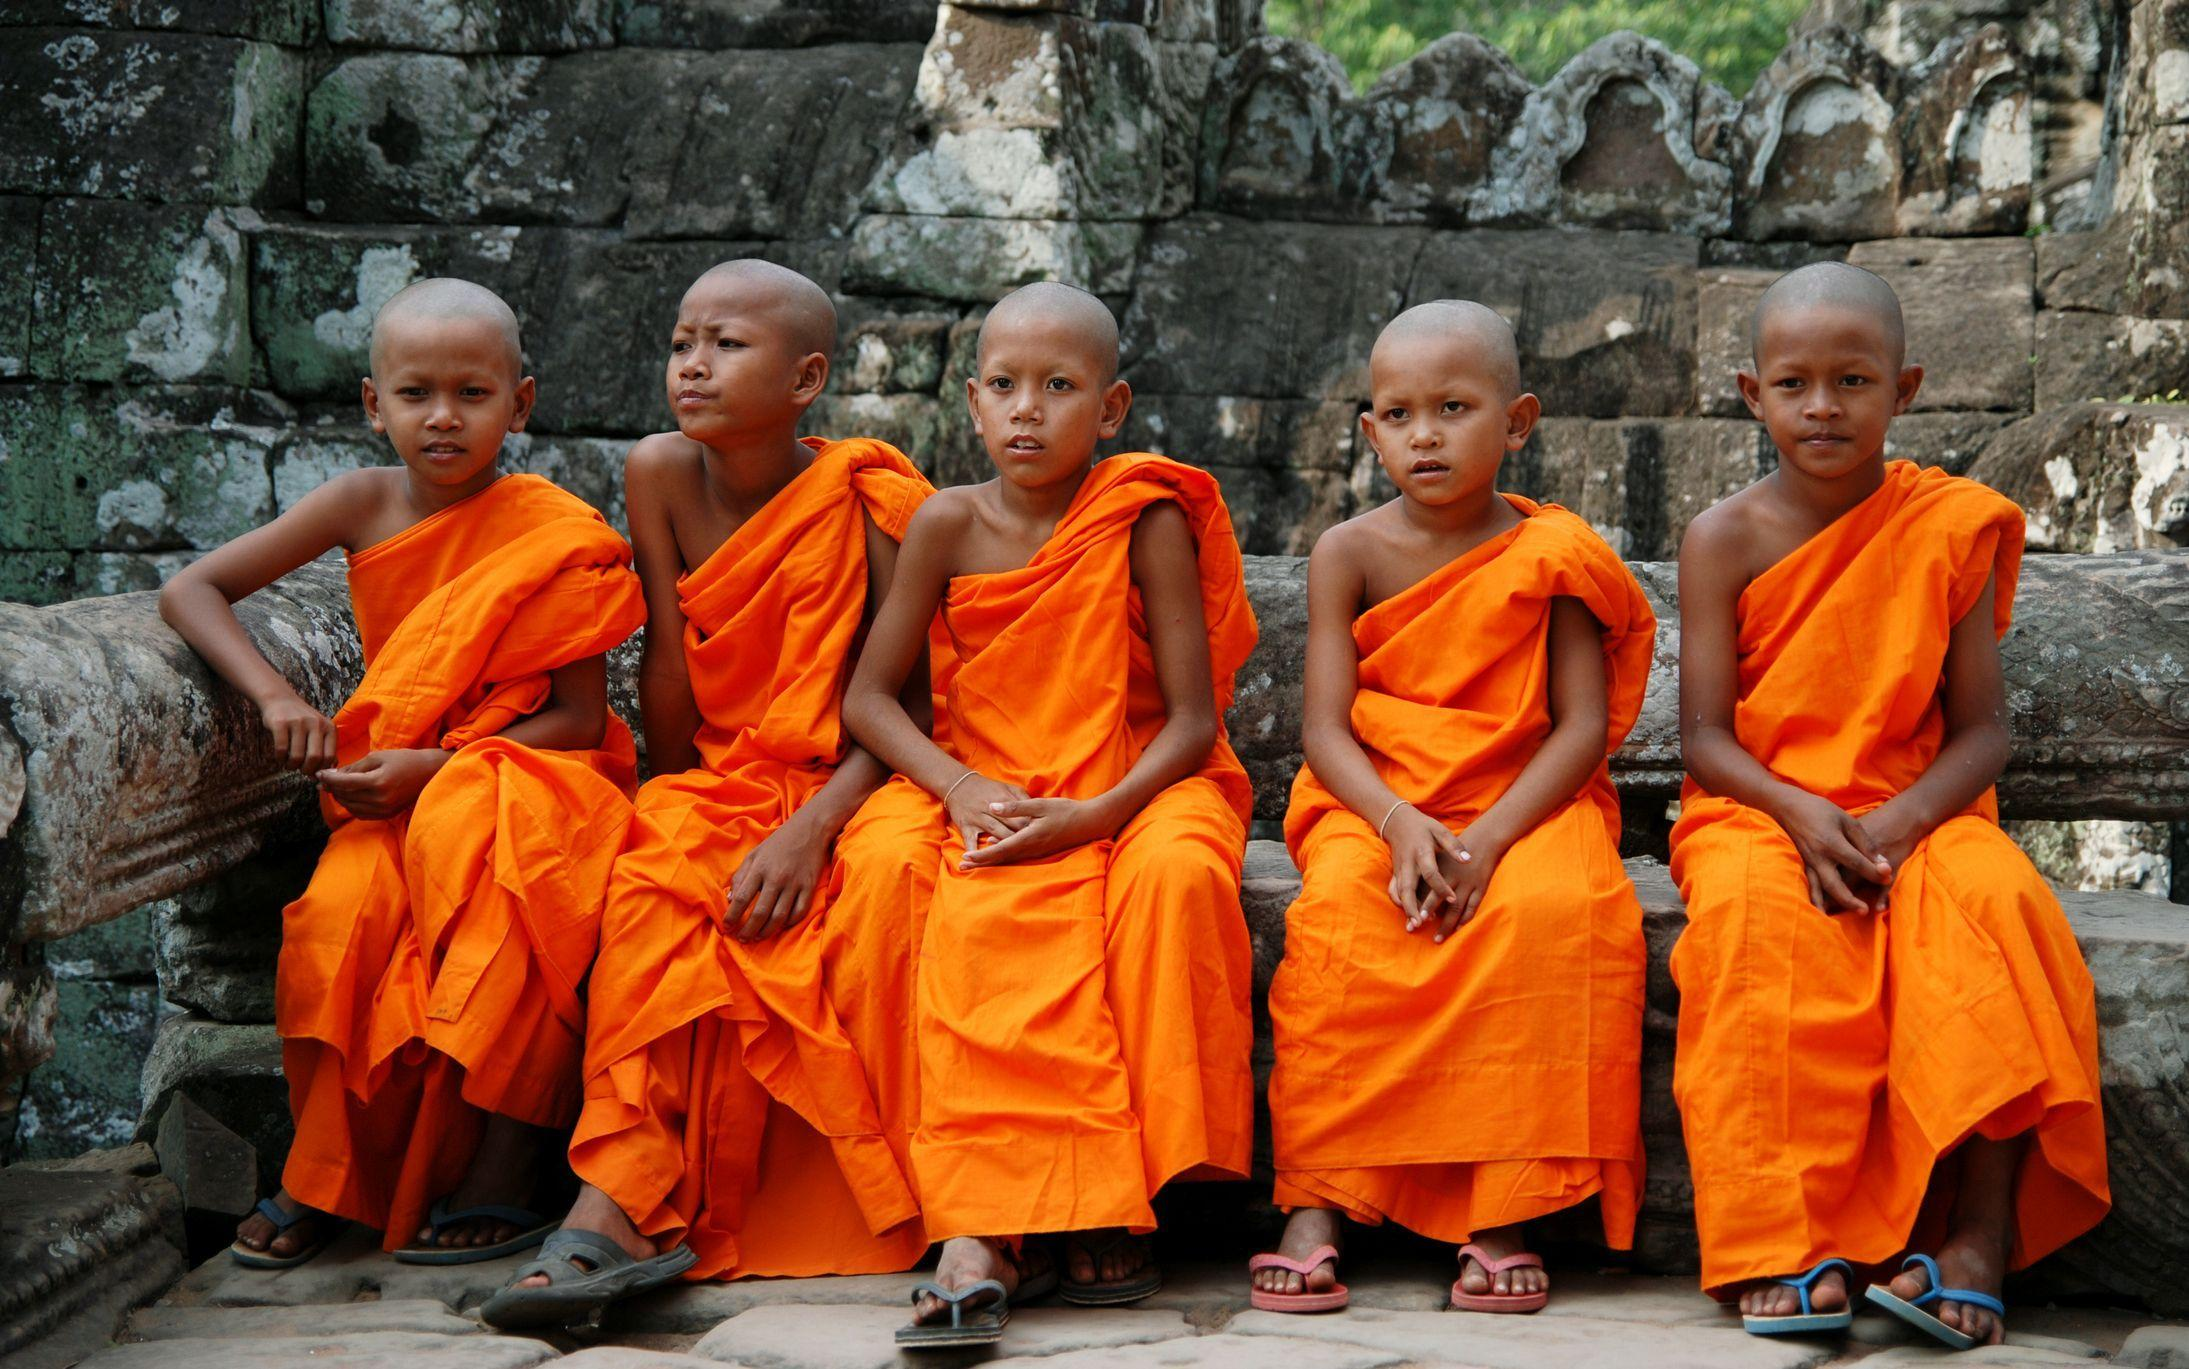 Народы Камбоджи буддисты